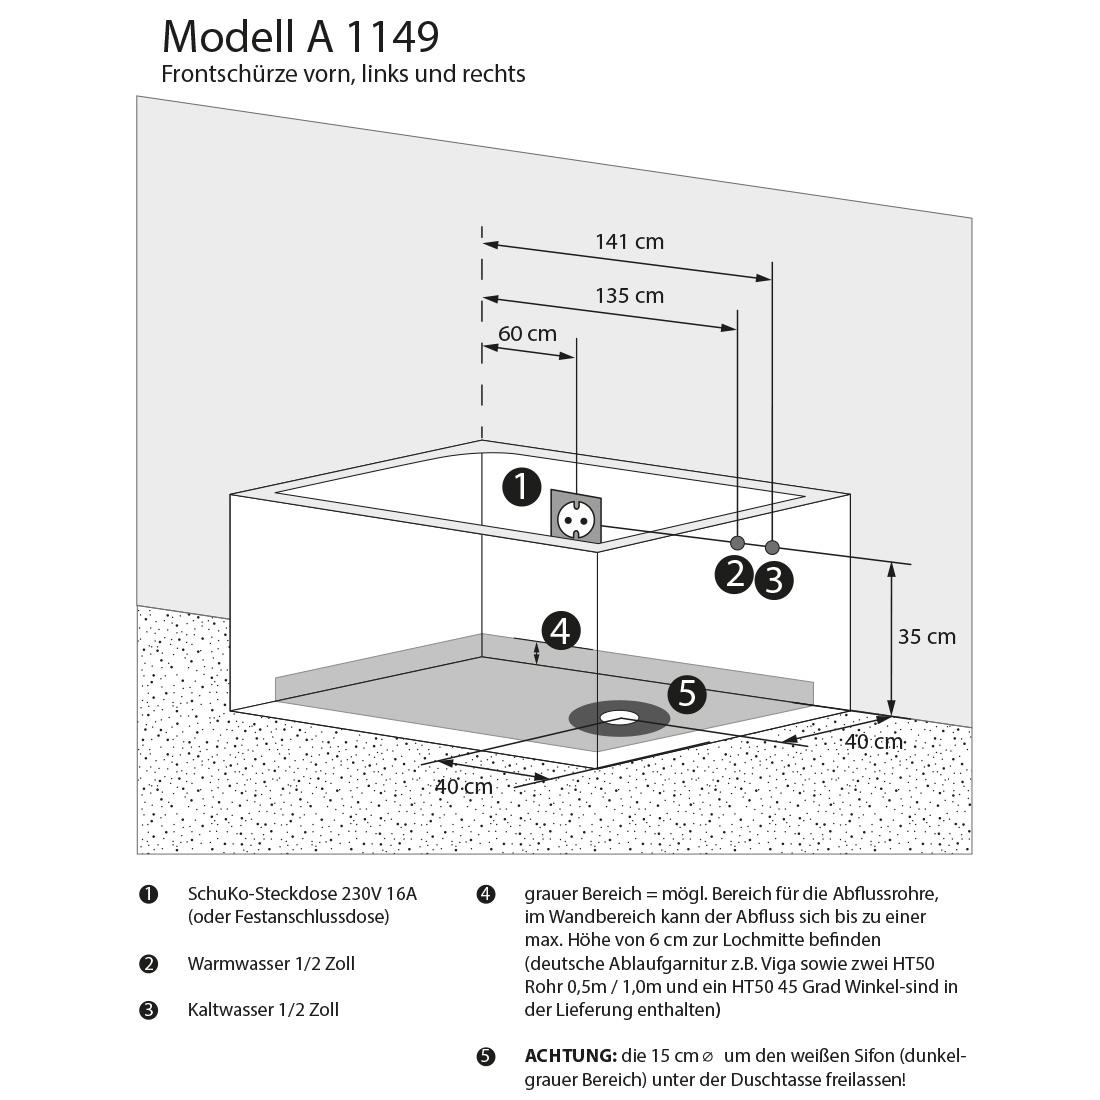 whirlpool vollausstattung pool badewanne wanne a1149 all 170x80cm. Black Bedroom Furniture Sets. Home Design Ideas